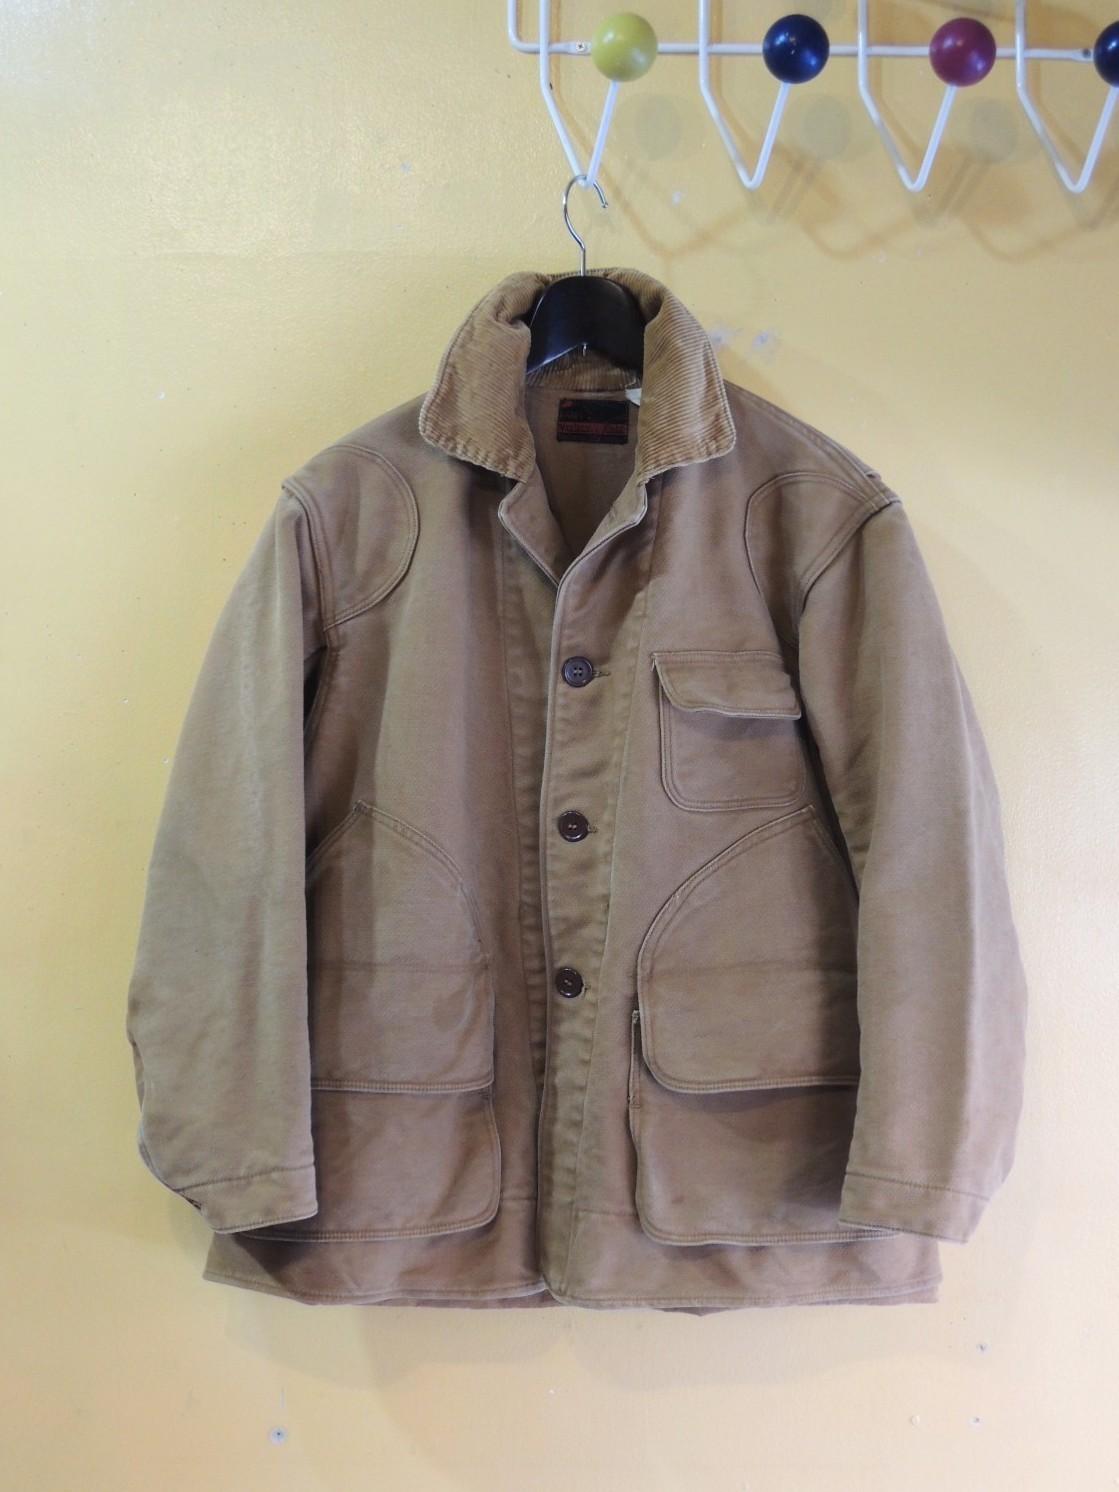 westernfieldmontgomerywardhuntinngjacket01.JPG